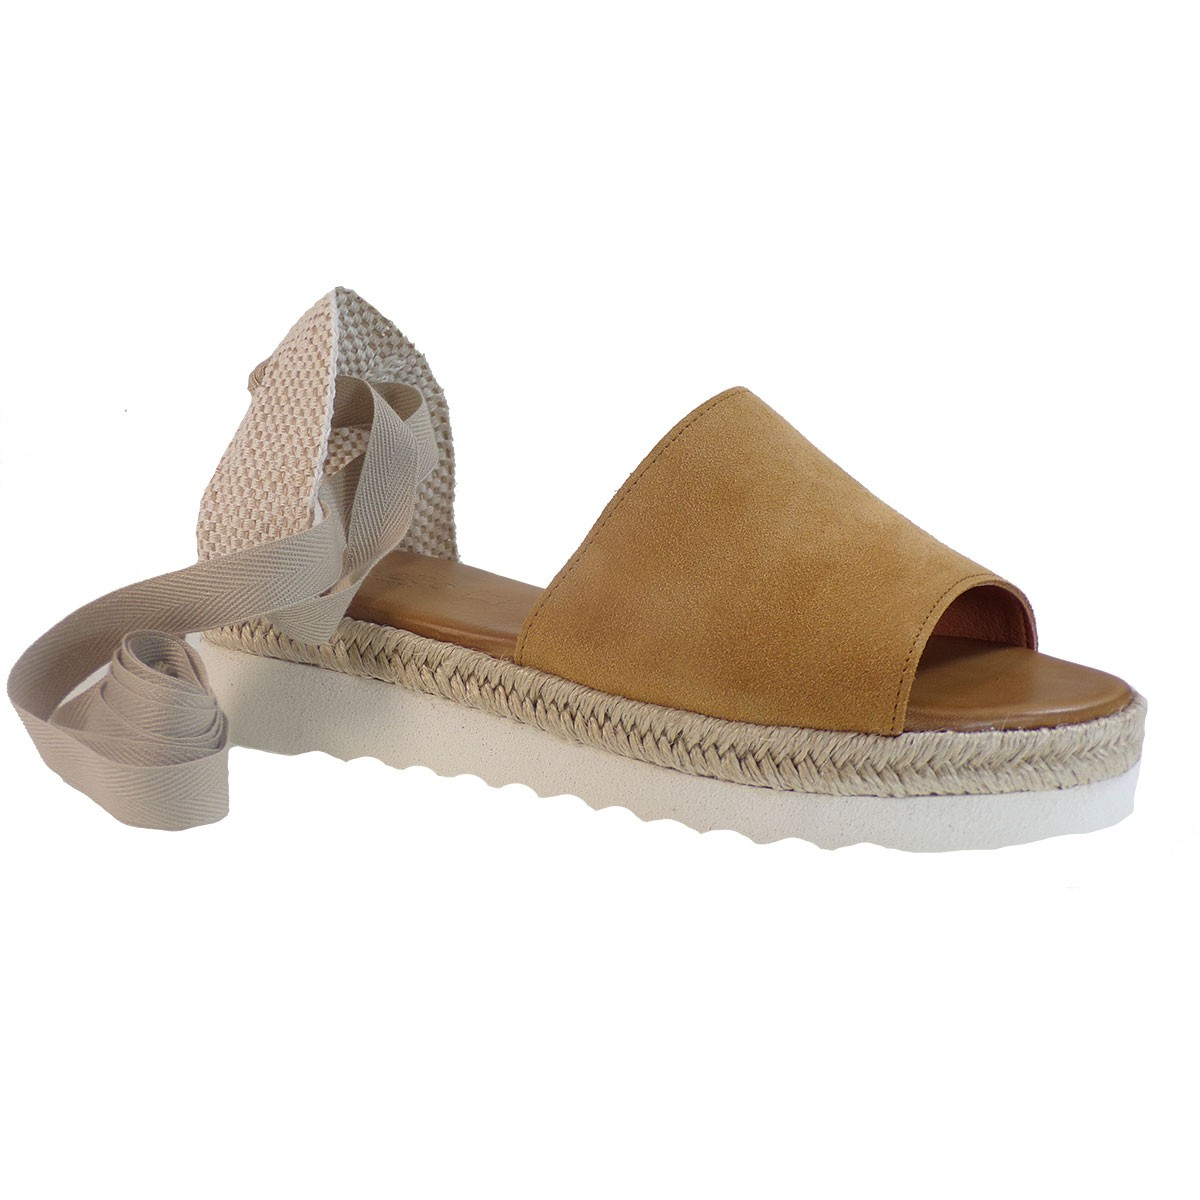 Katia Shoes Anneto Γυναικείες Εσπαντρίγιες Κ159-P Κάμελ